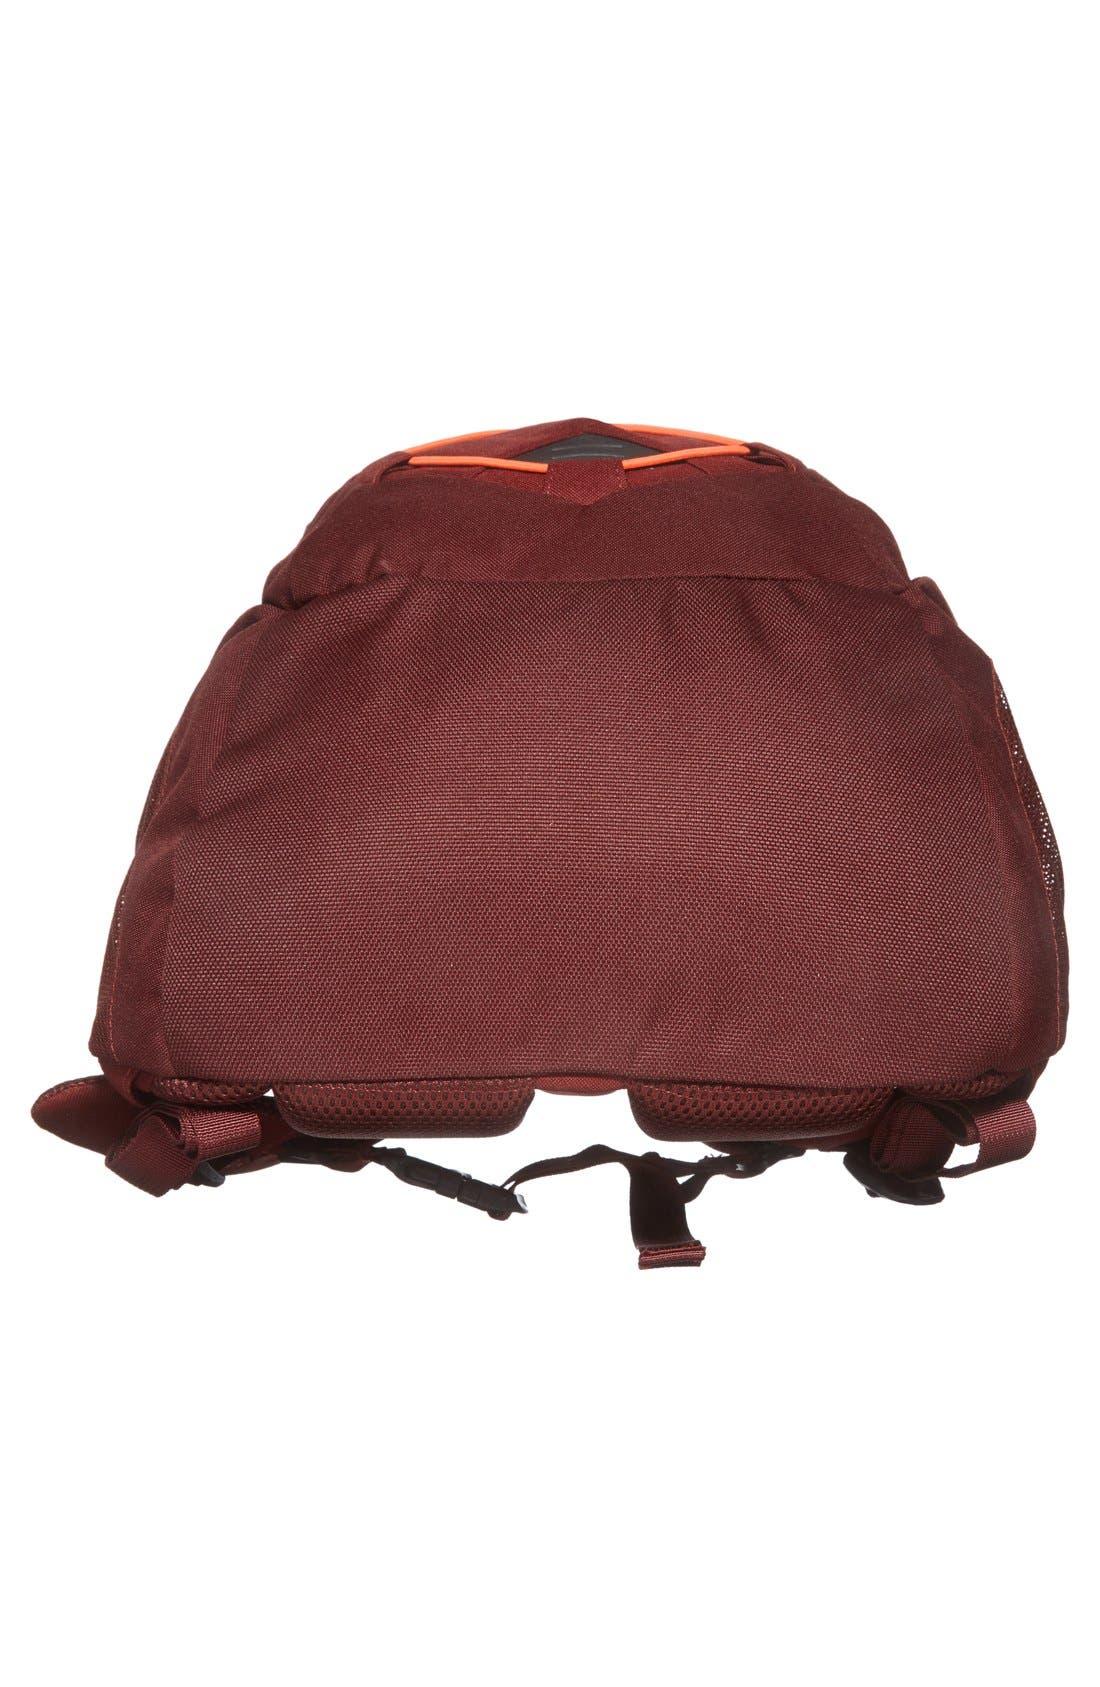 'Jester' Backpack,                             Alternate thumbnail 86, color,